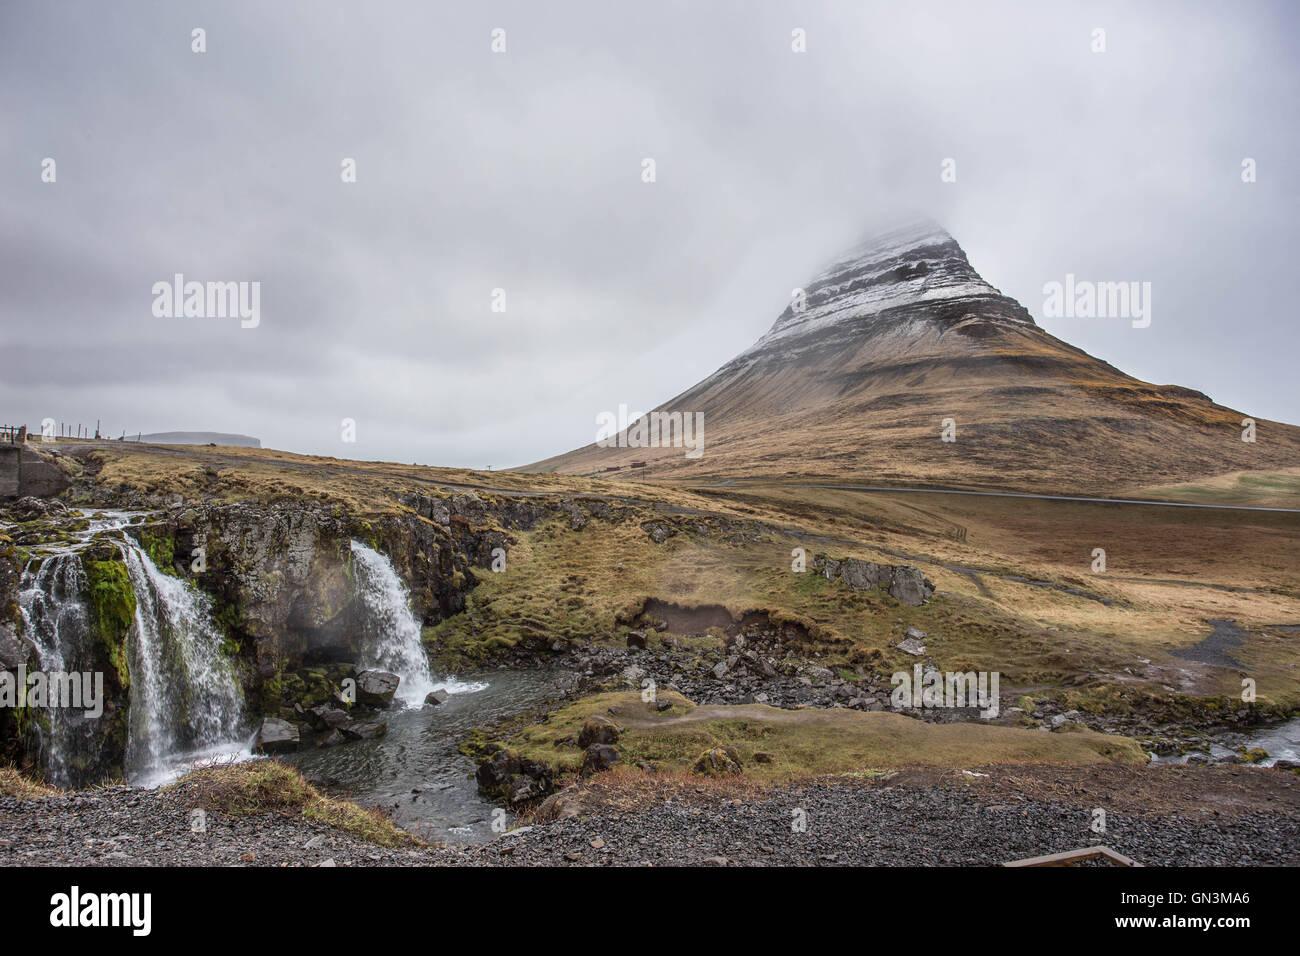 Kirkjufell Mountain, Iceland Landscapes - Stock Image